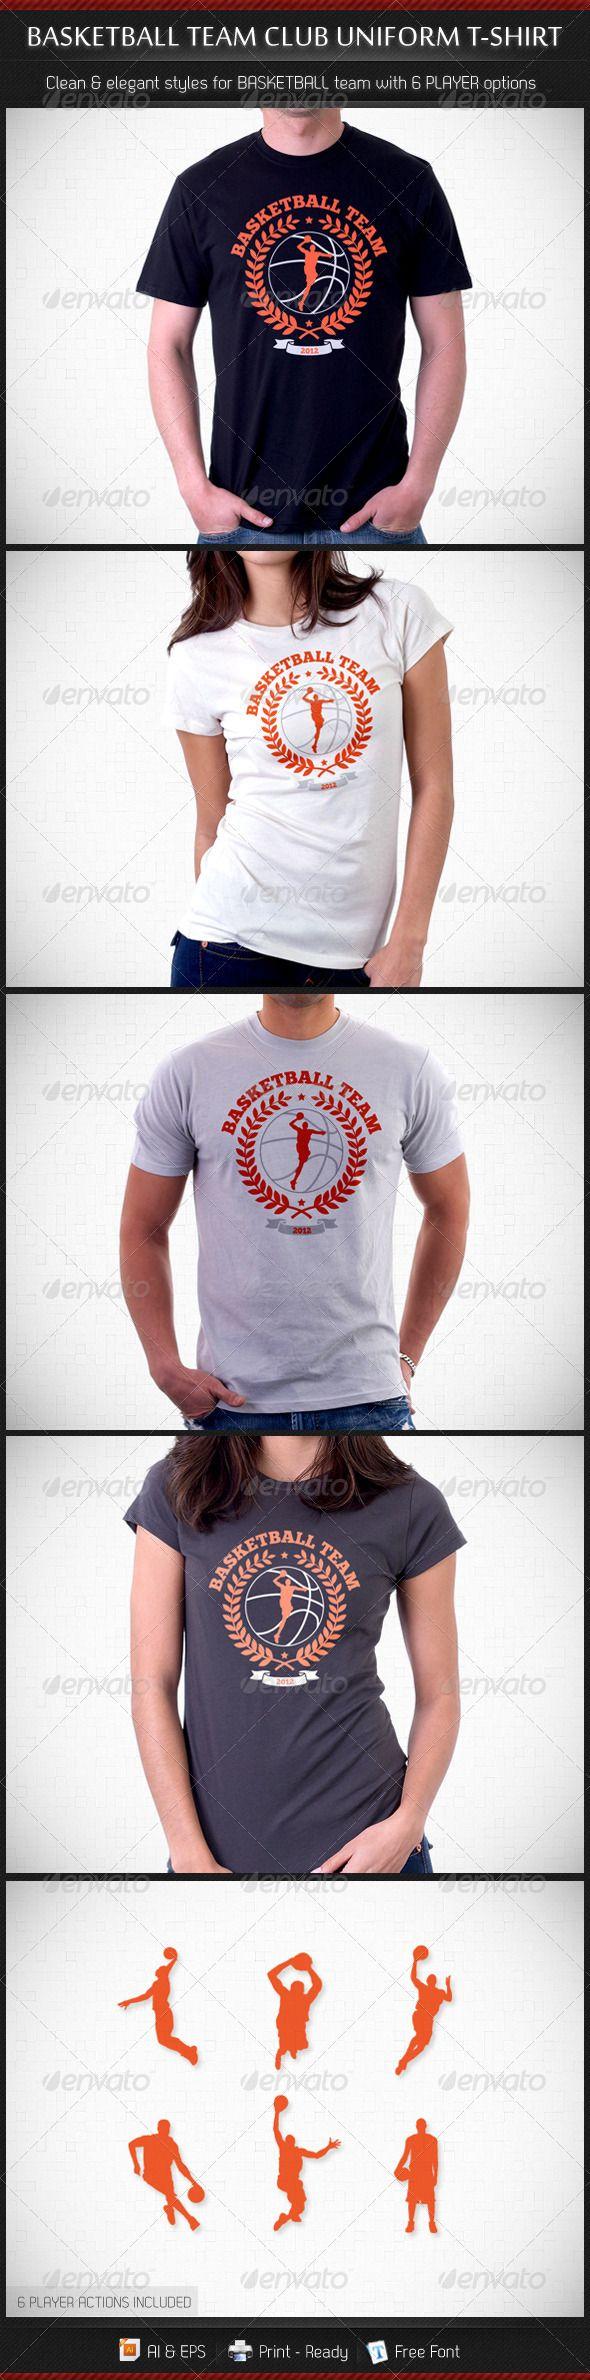 Basketball Team Club Uniform T-Shirt - DOWNLOAD NOW